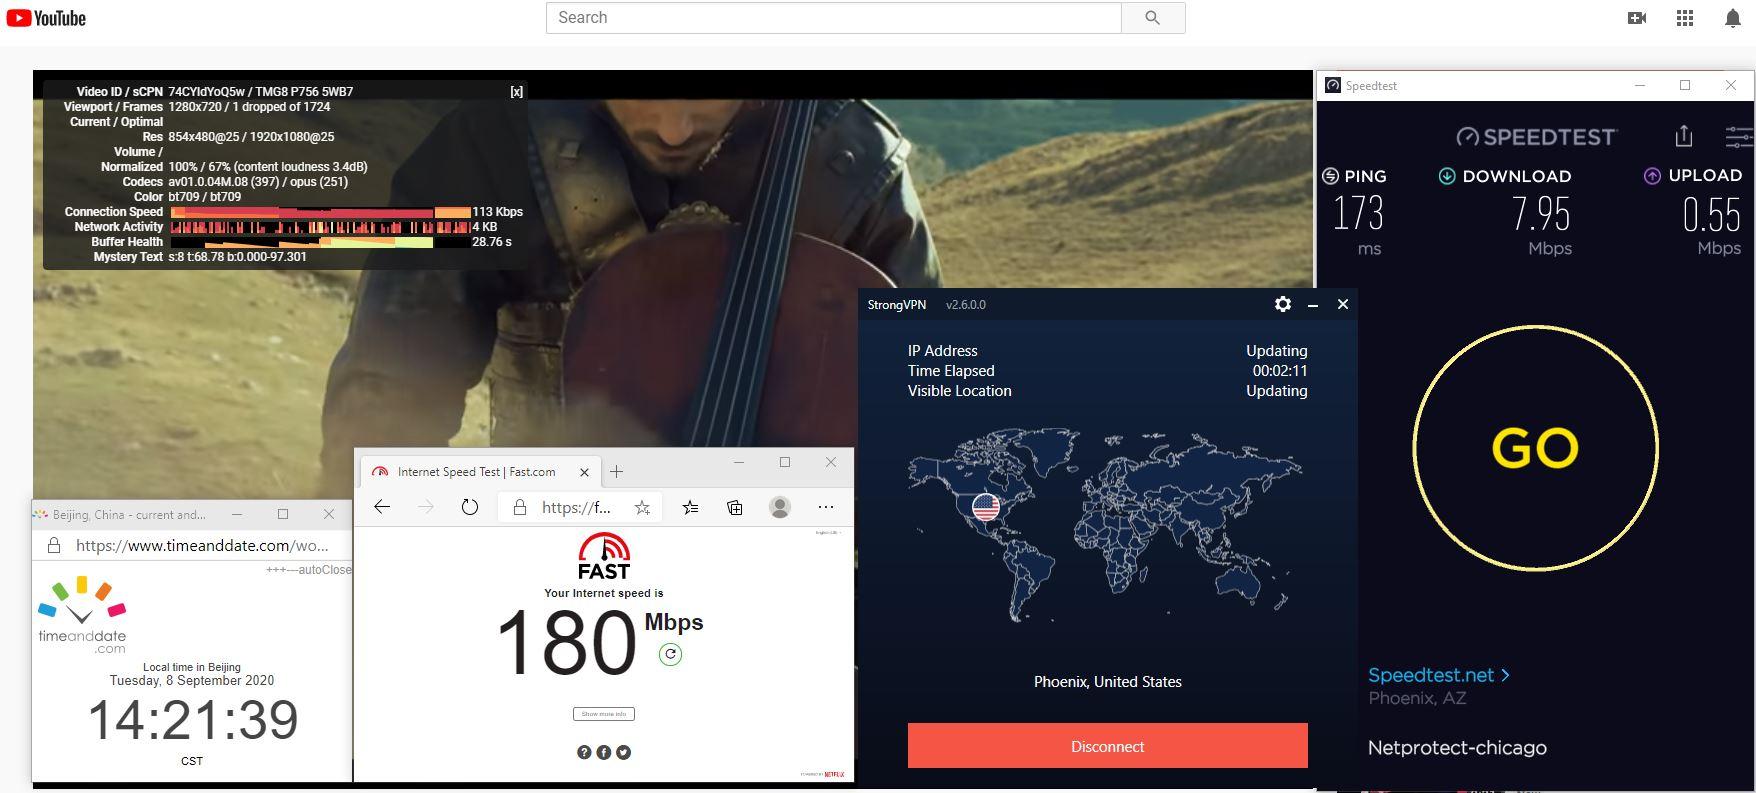 Windows10 StrongVPN USA - Phoenix 中国VPN 翻墙 科学上网 翻墙速度测试 - 20200908